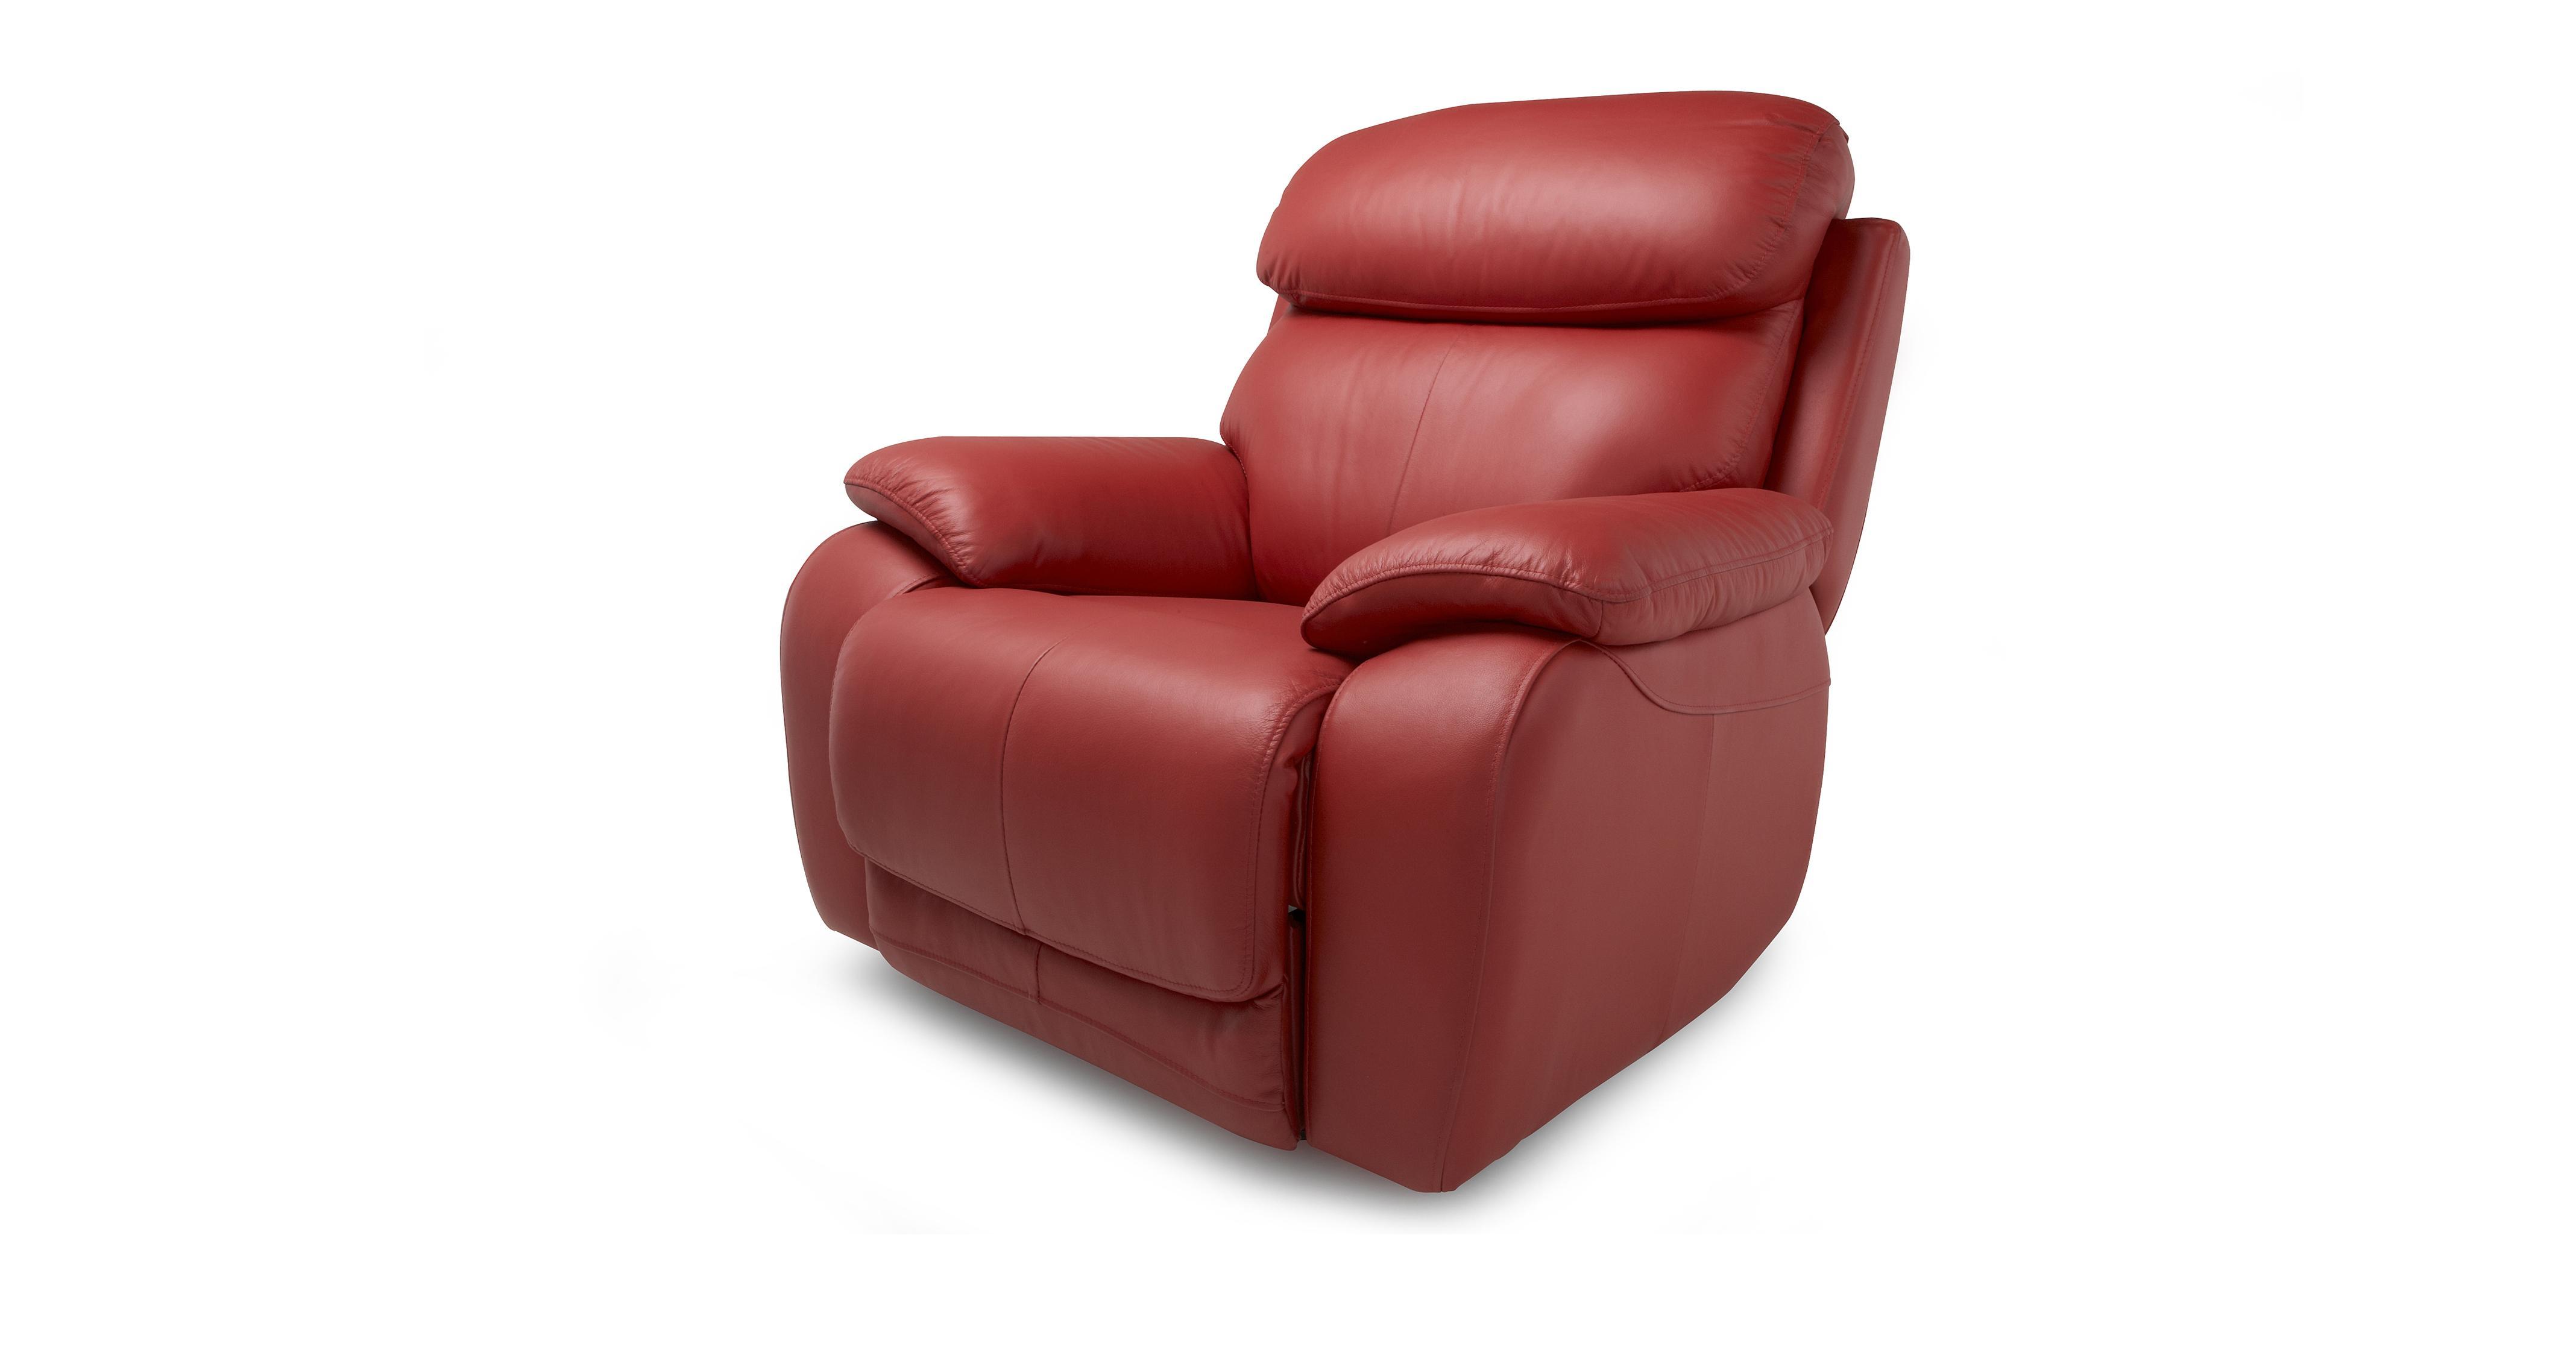 Incredible Daytona Manual Recliner Chair Alphanode Cool Chair Designs And Ideas Alphanodeonline